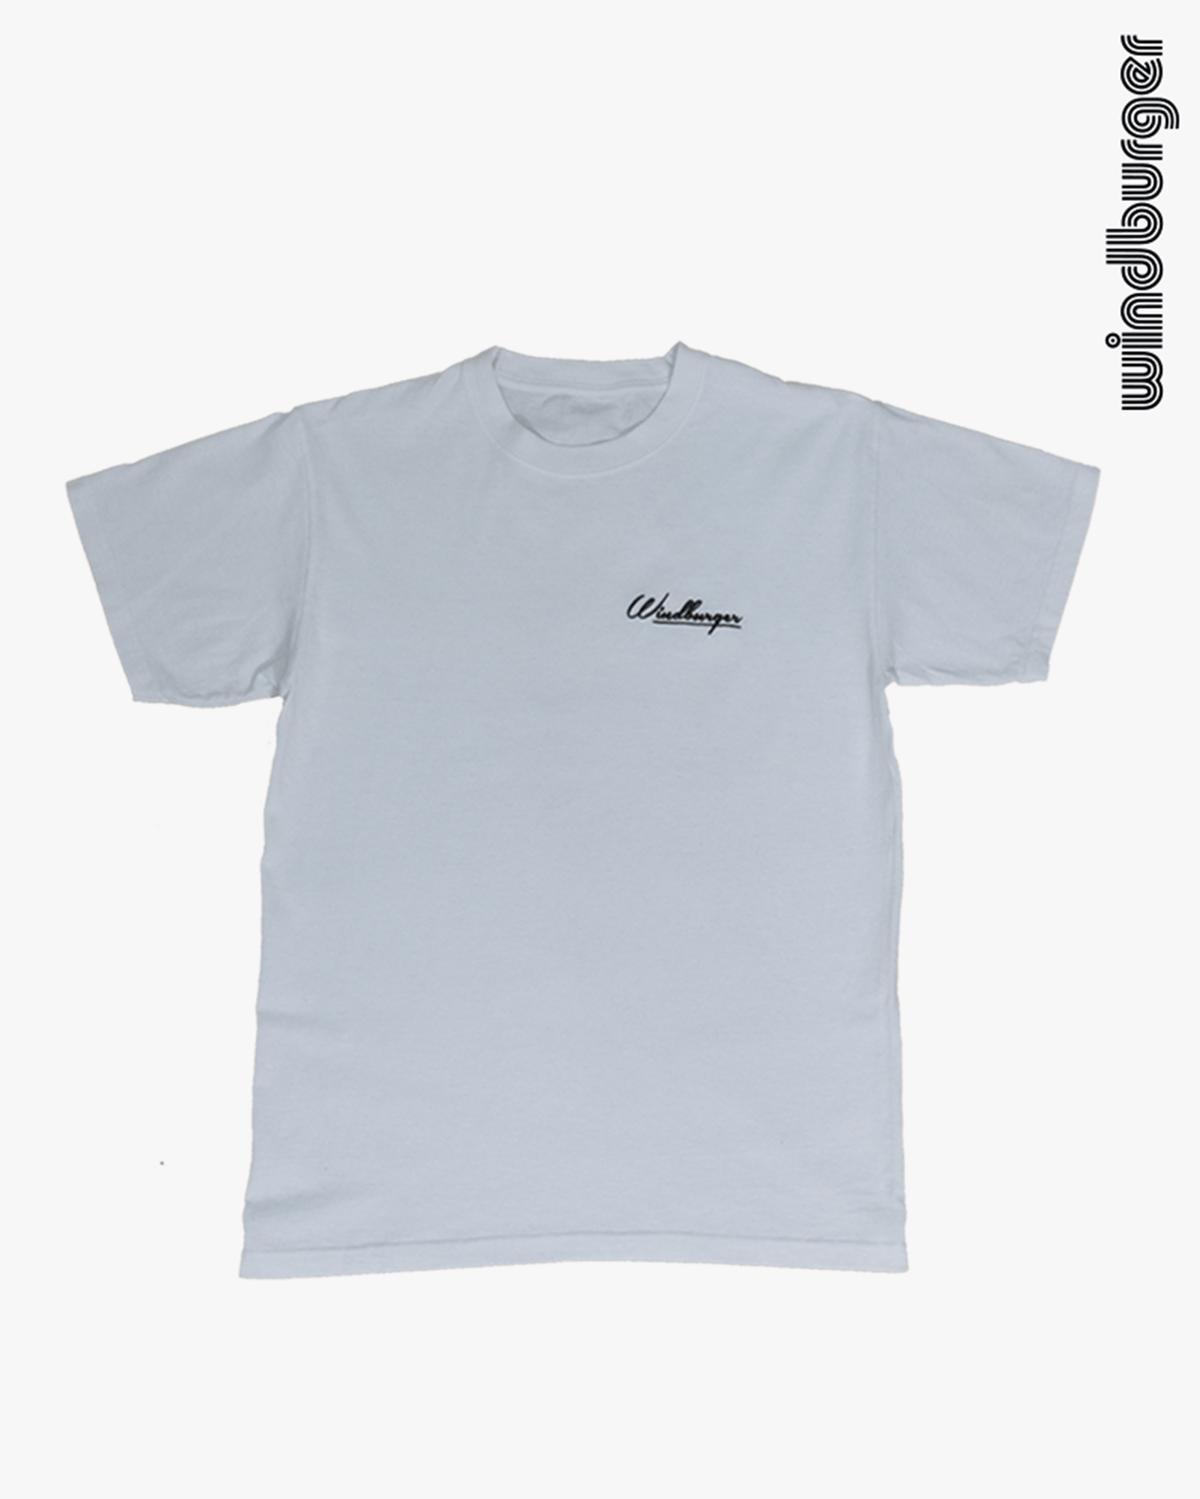 Image of white windburger t-shirt